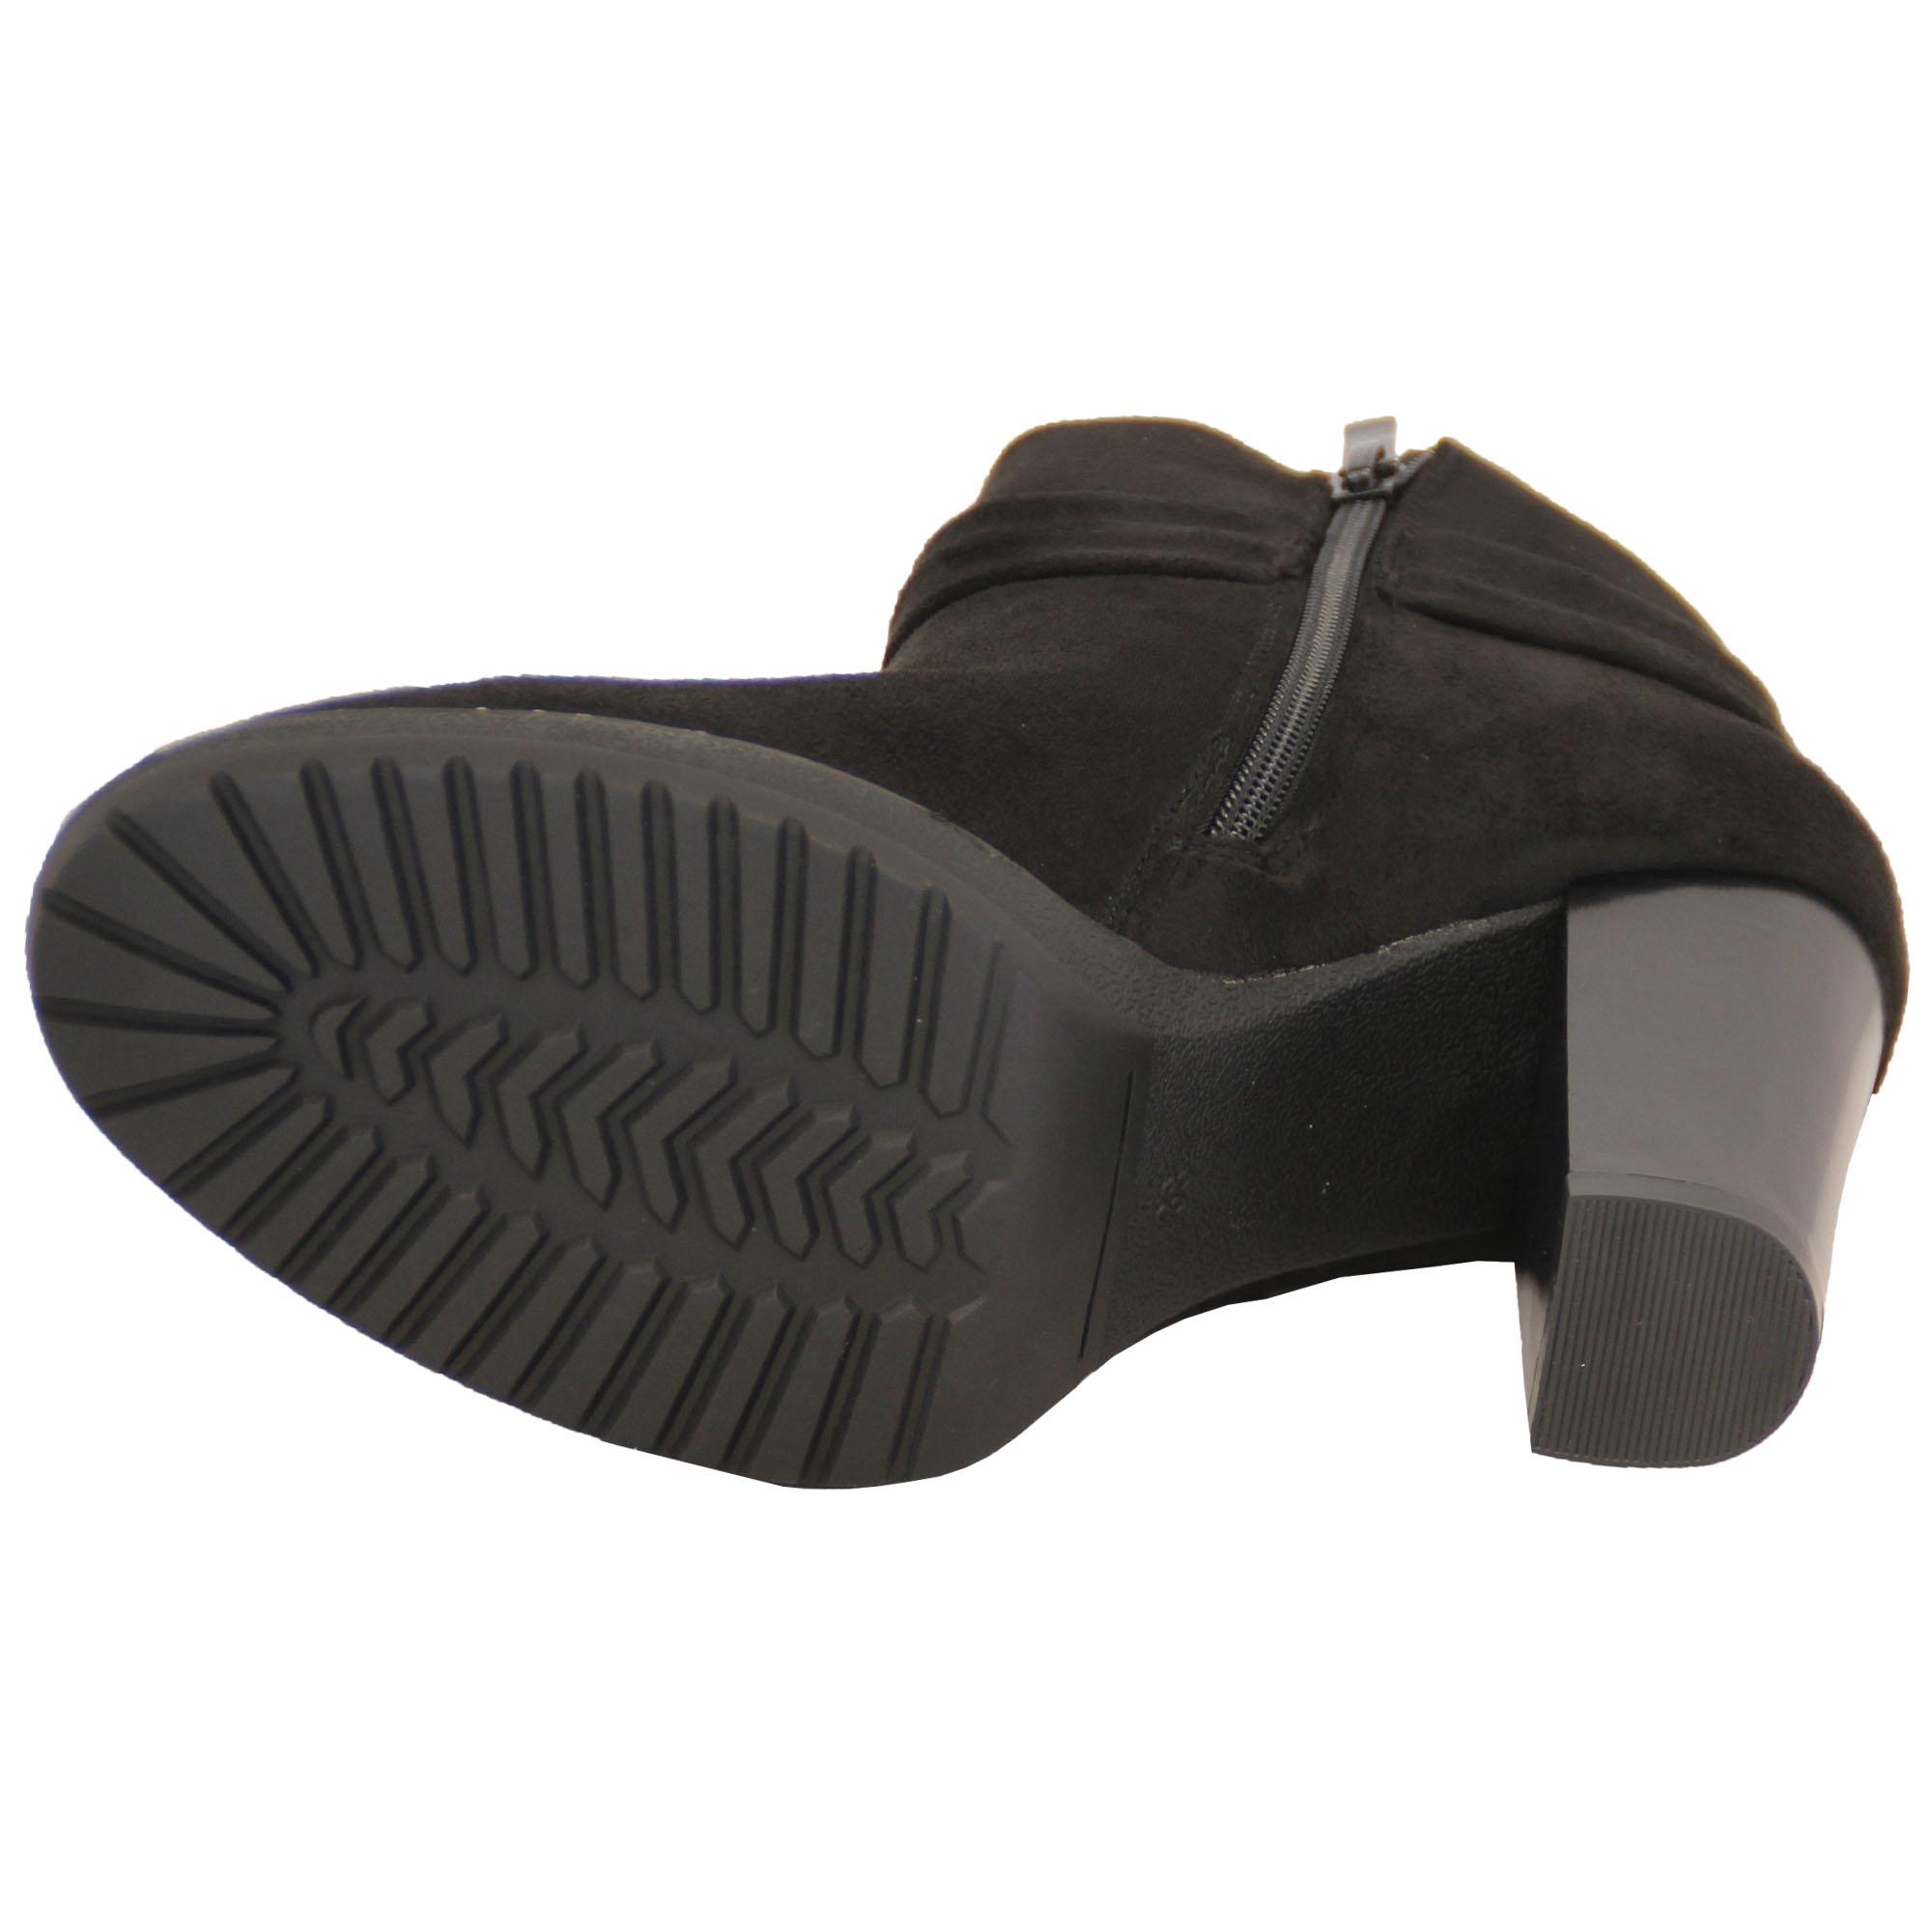 Damen Chelsea Biker Boots Damen Wildleder-Optik Schuhe block-plattform hoch